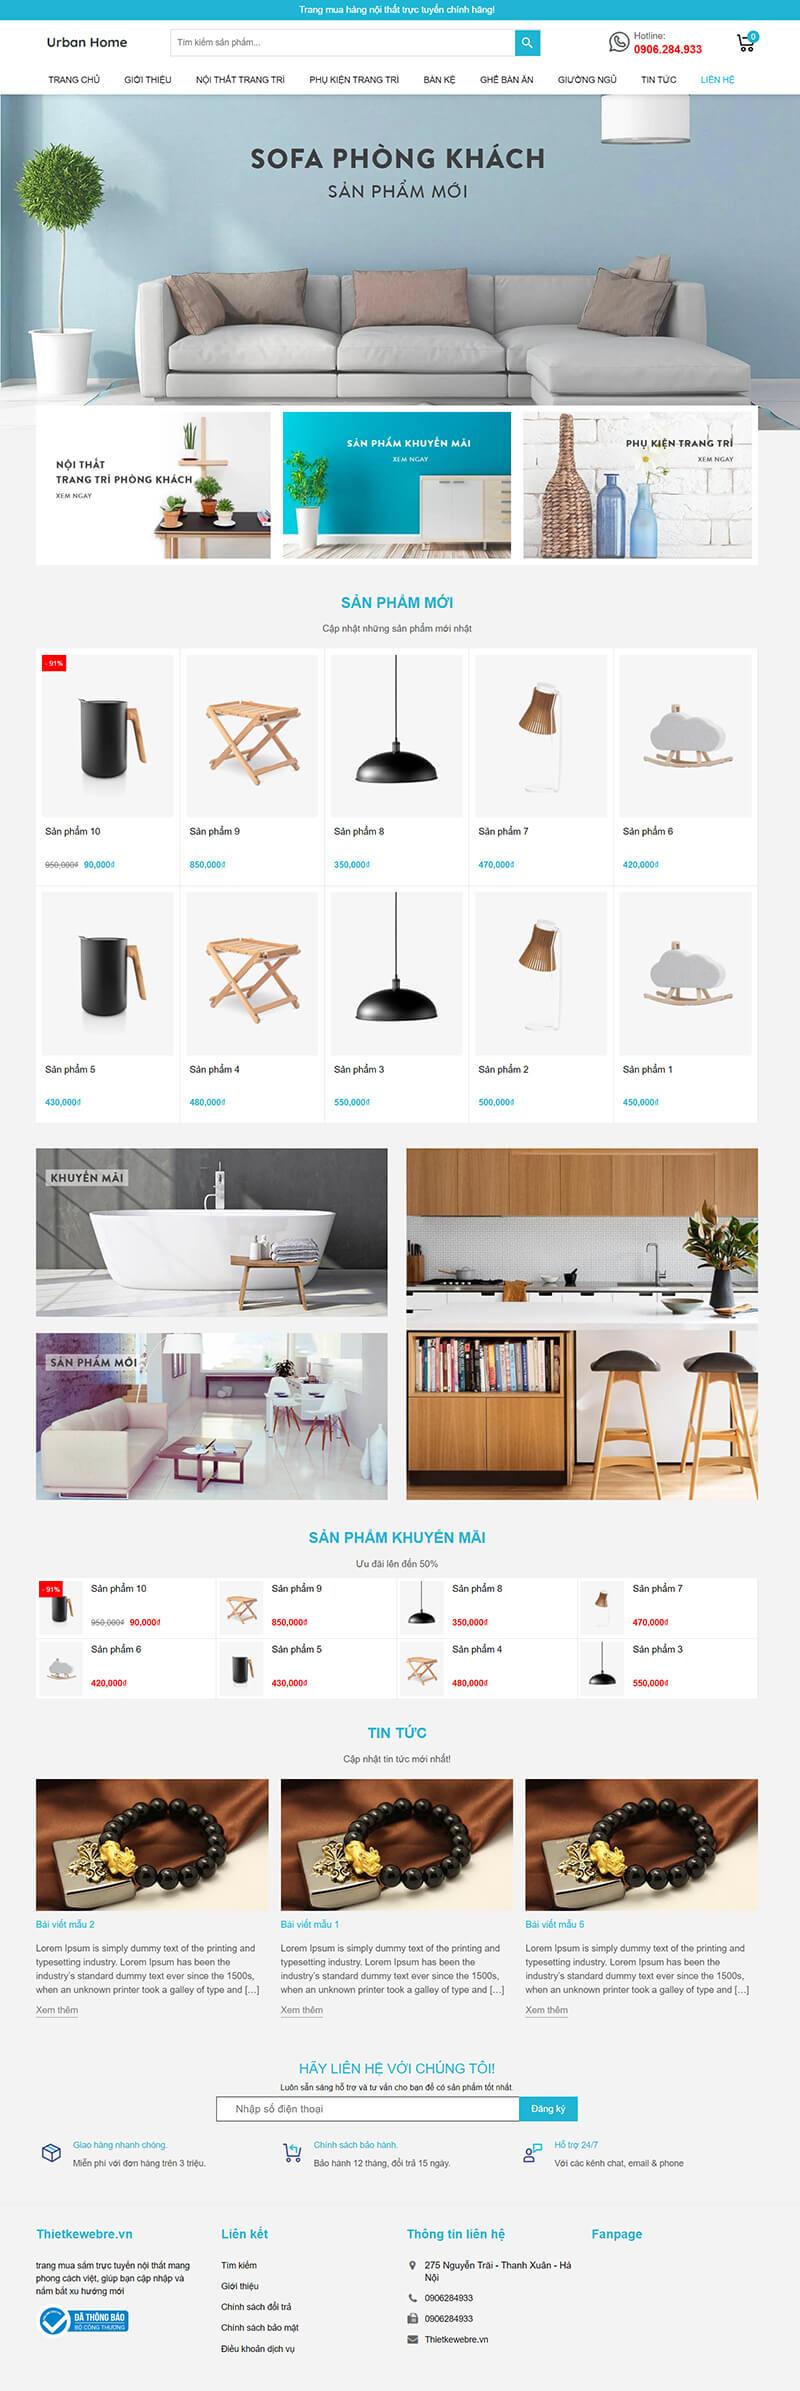 Thiết kế website nội thất Urban